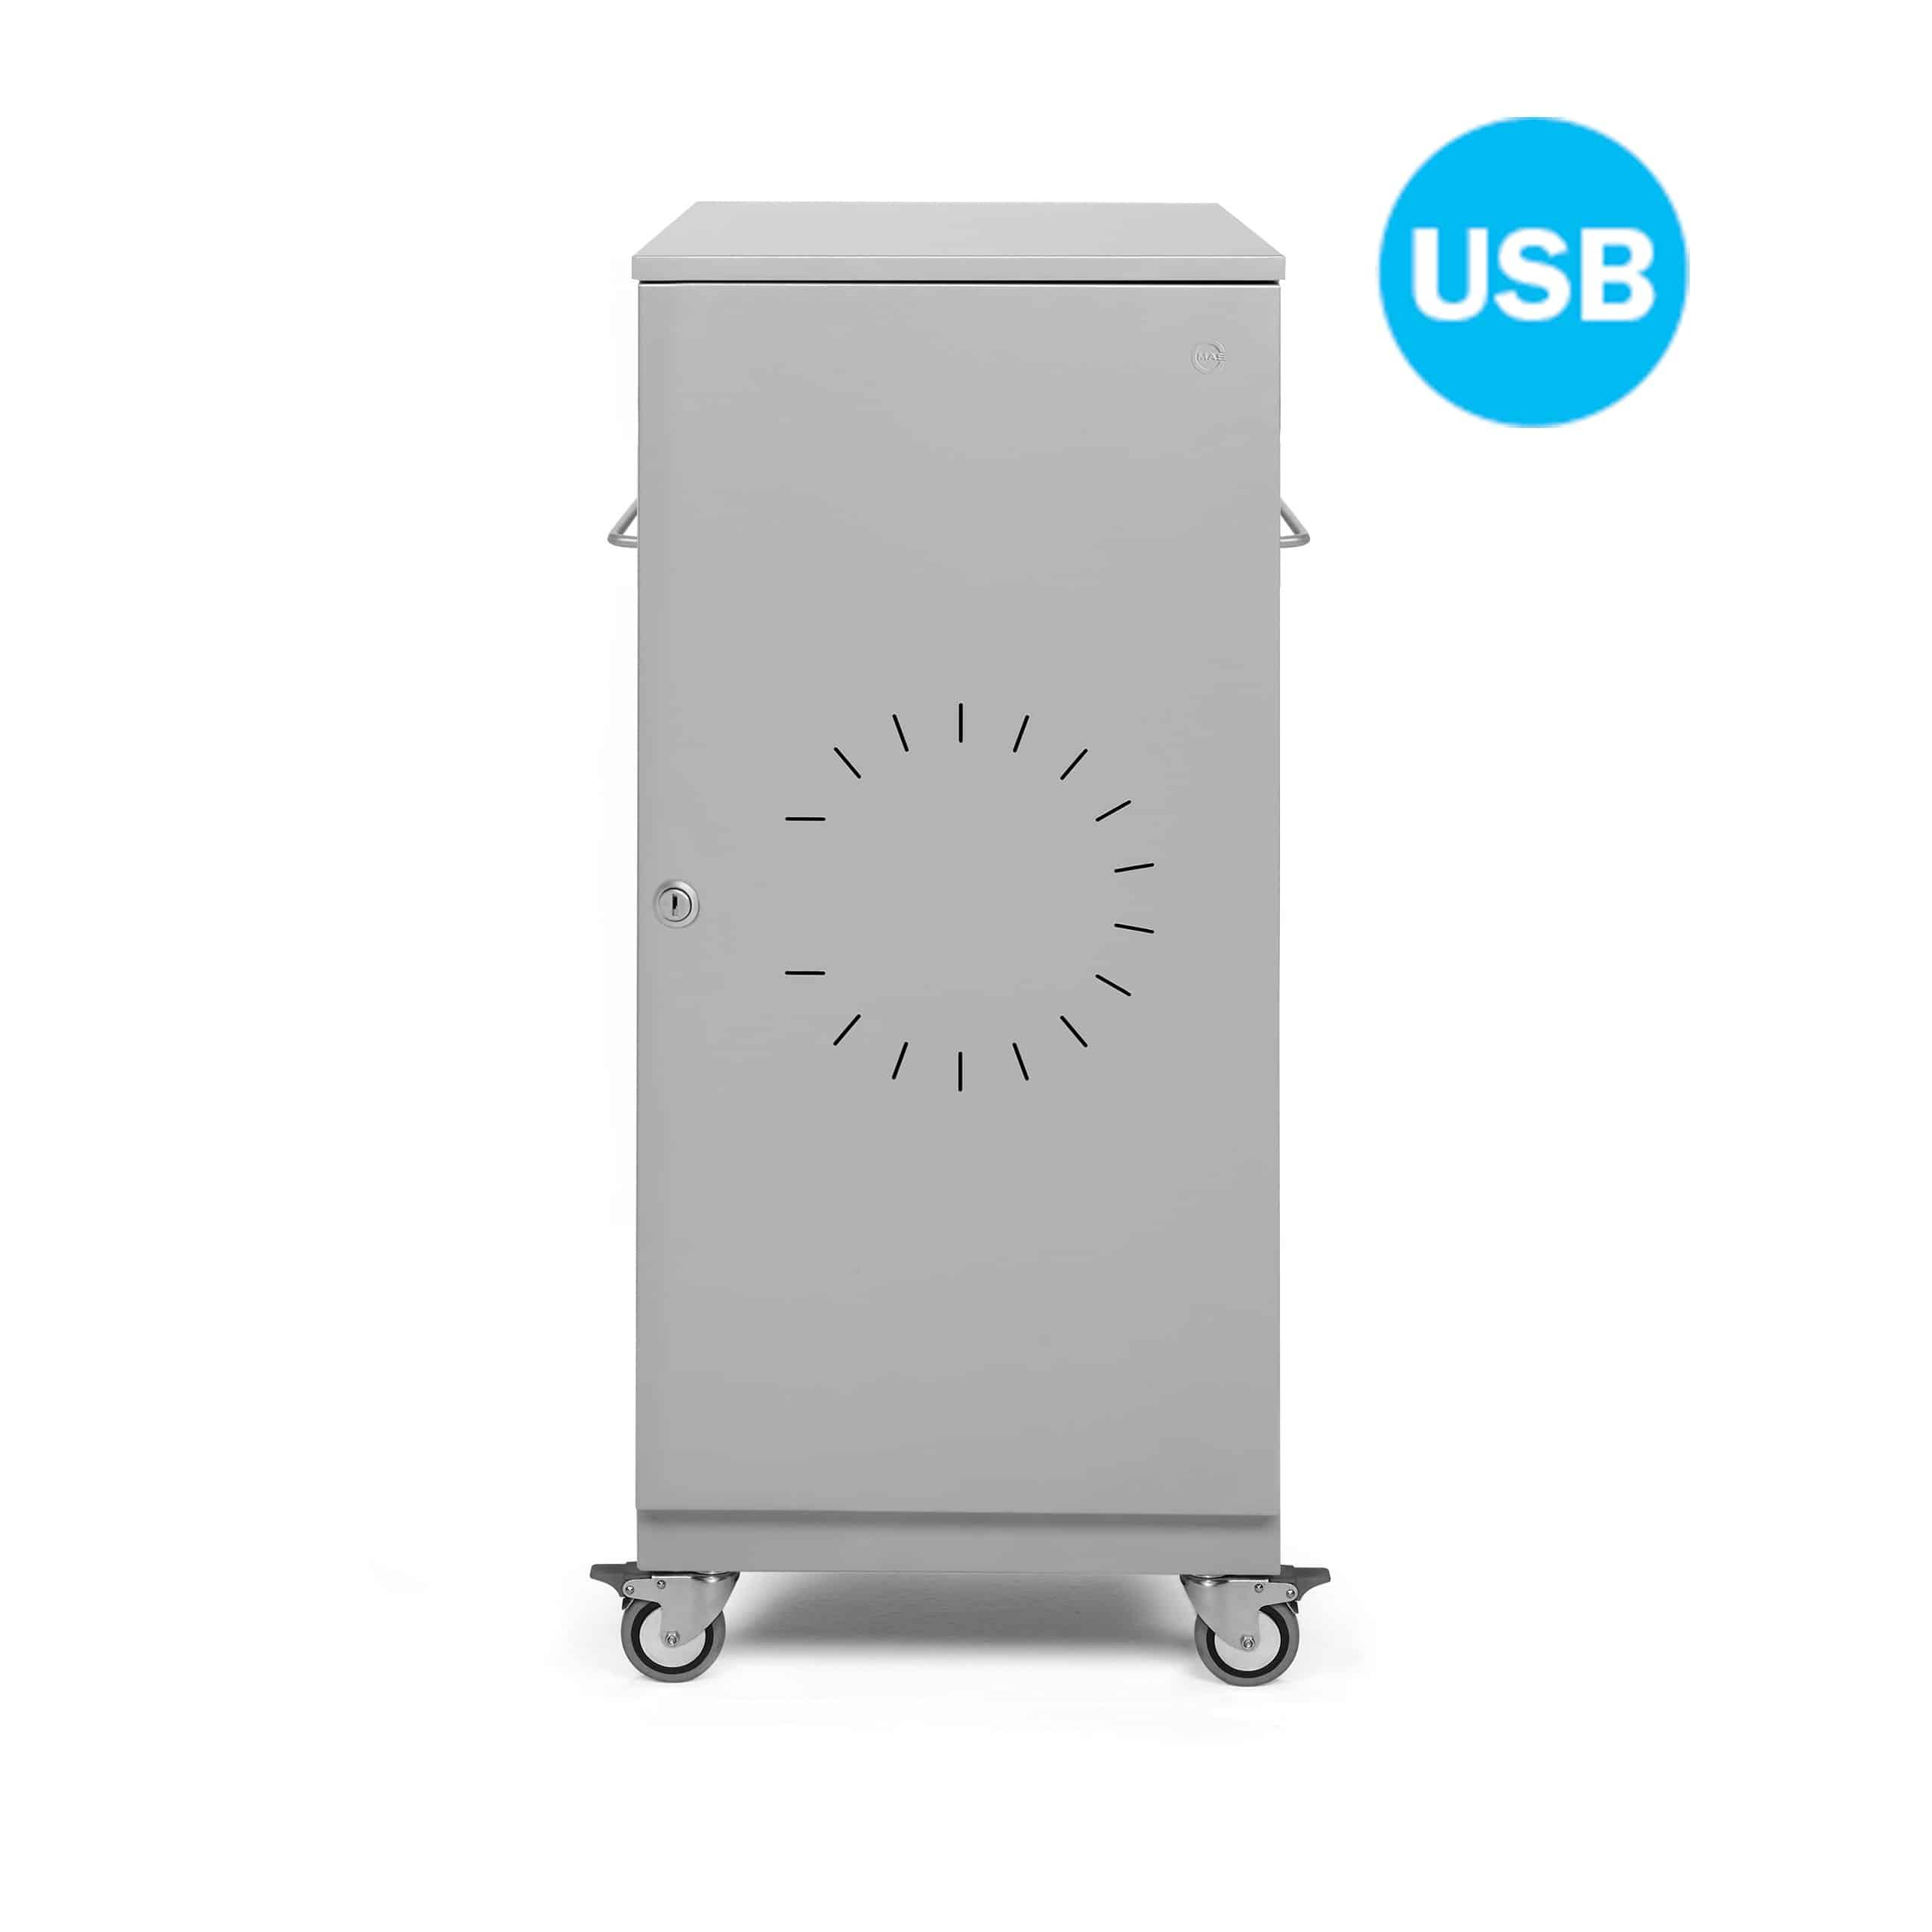 iOrder PAD MMO 1050 USB